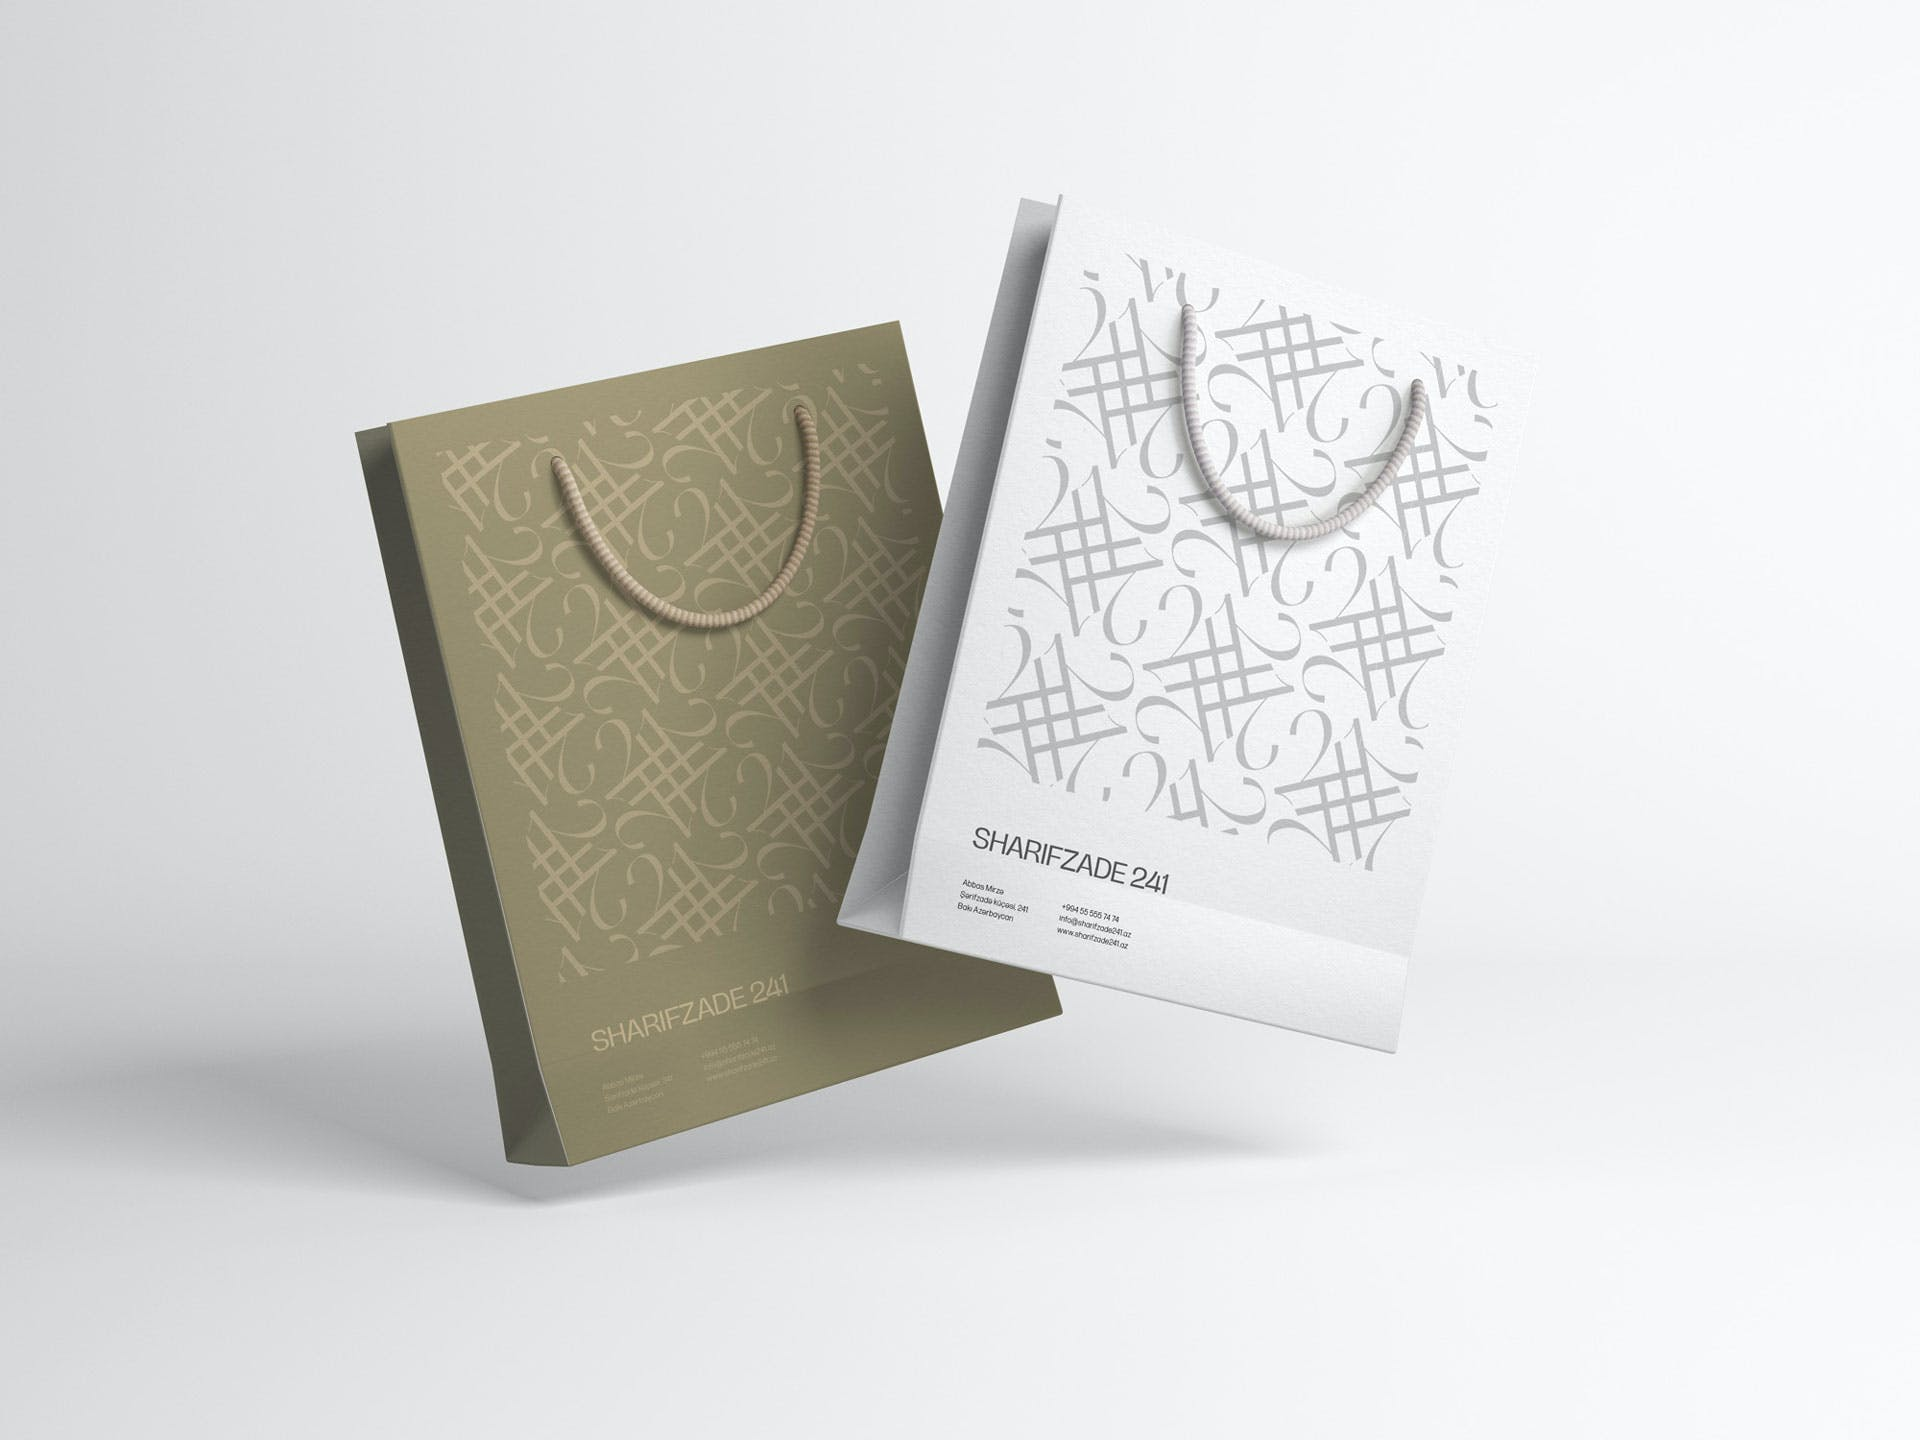 SHARIFZADE-241 BRANDING - Paper bag